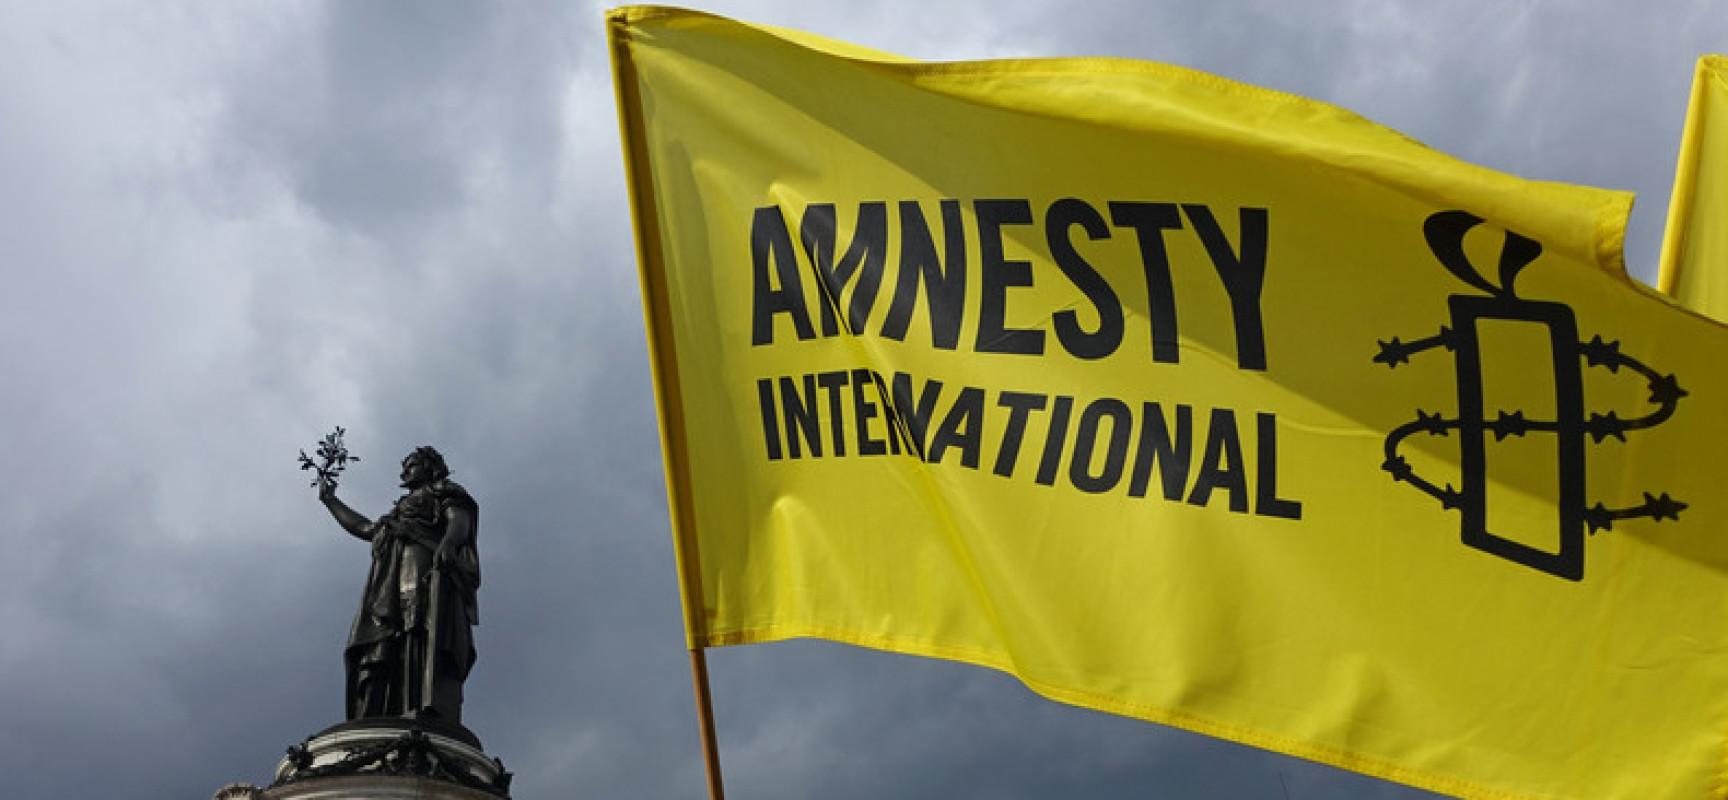 Amnesty International embarrassée par son ancien soutien à un djihadiste belge